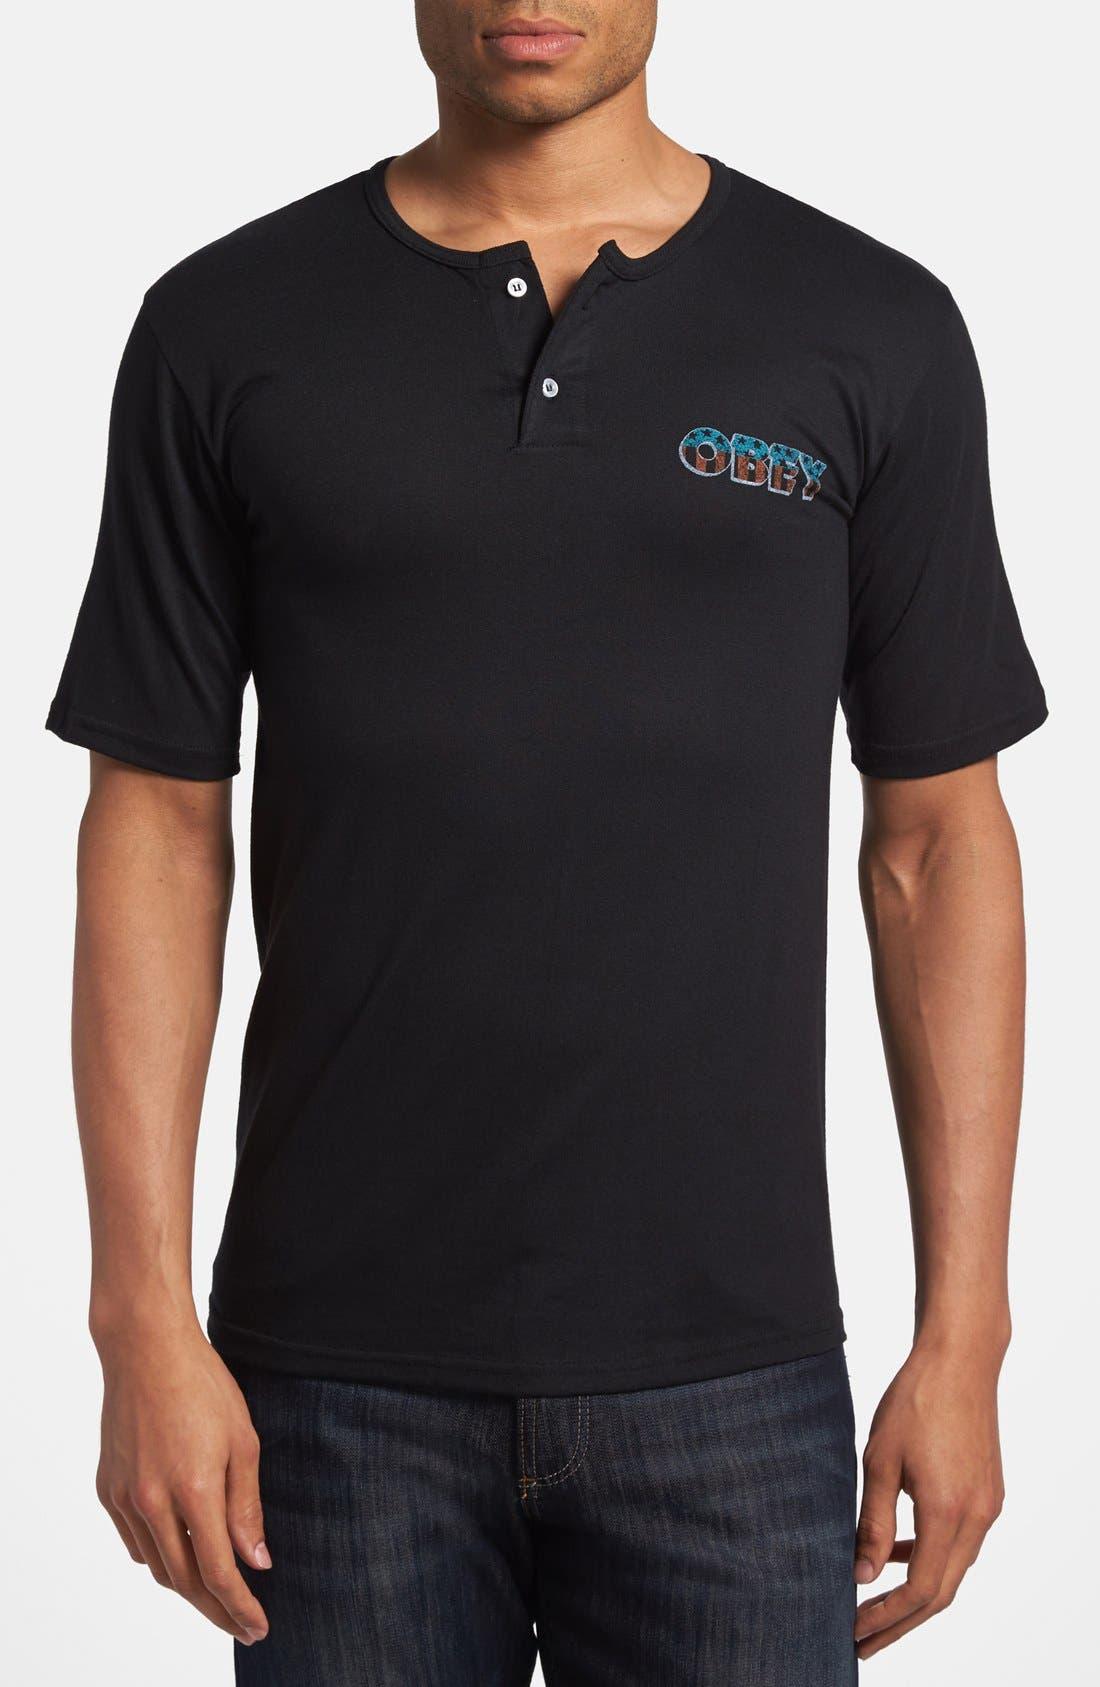 Alternate Image 1 Selected - Obey 'Spirit of the Street' Short Sleeve Henley T-Shirt